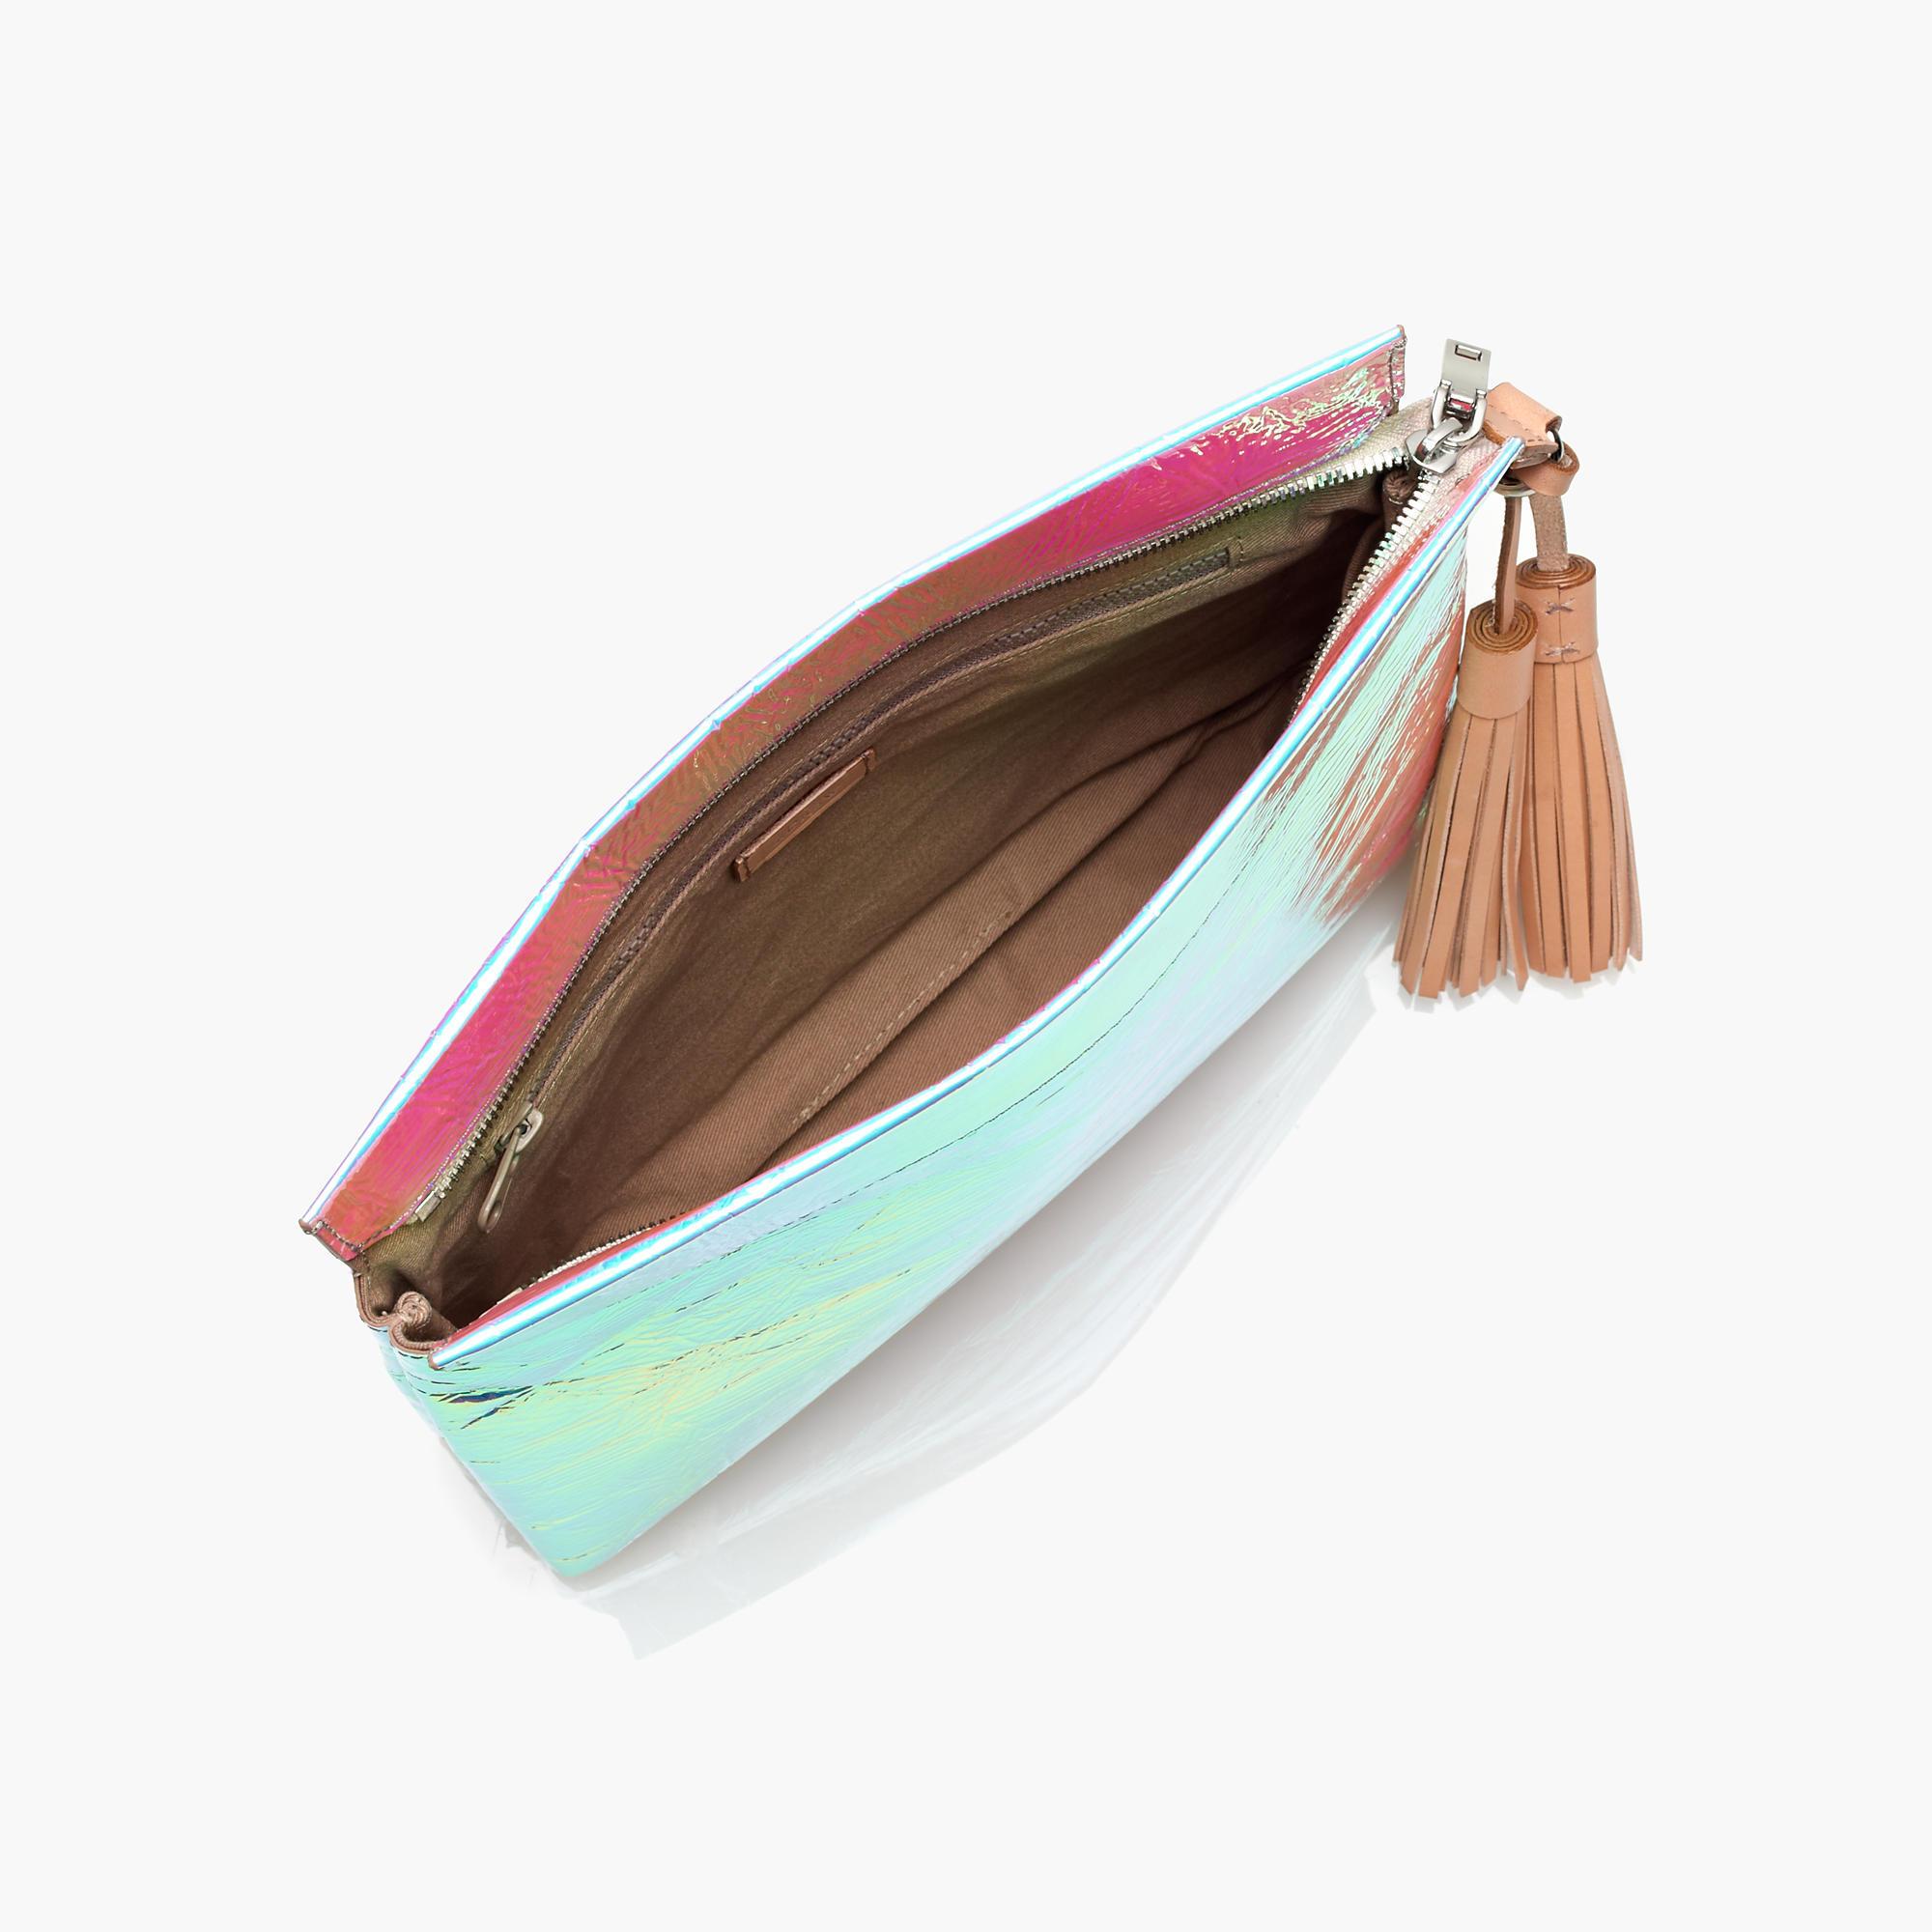 Fashionable Holographic White Pu Clutch Bag Iridescent Pouch Handbag